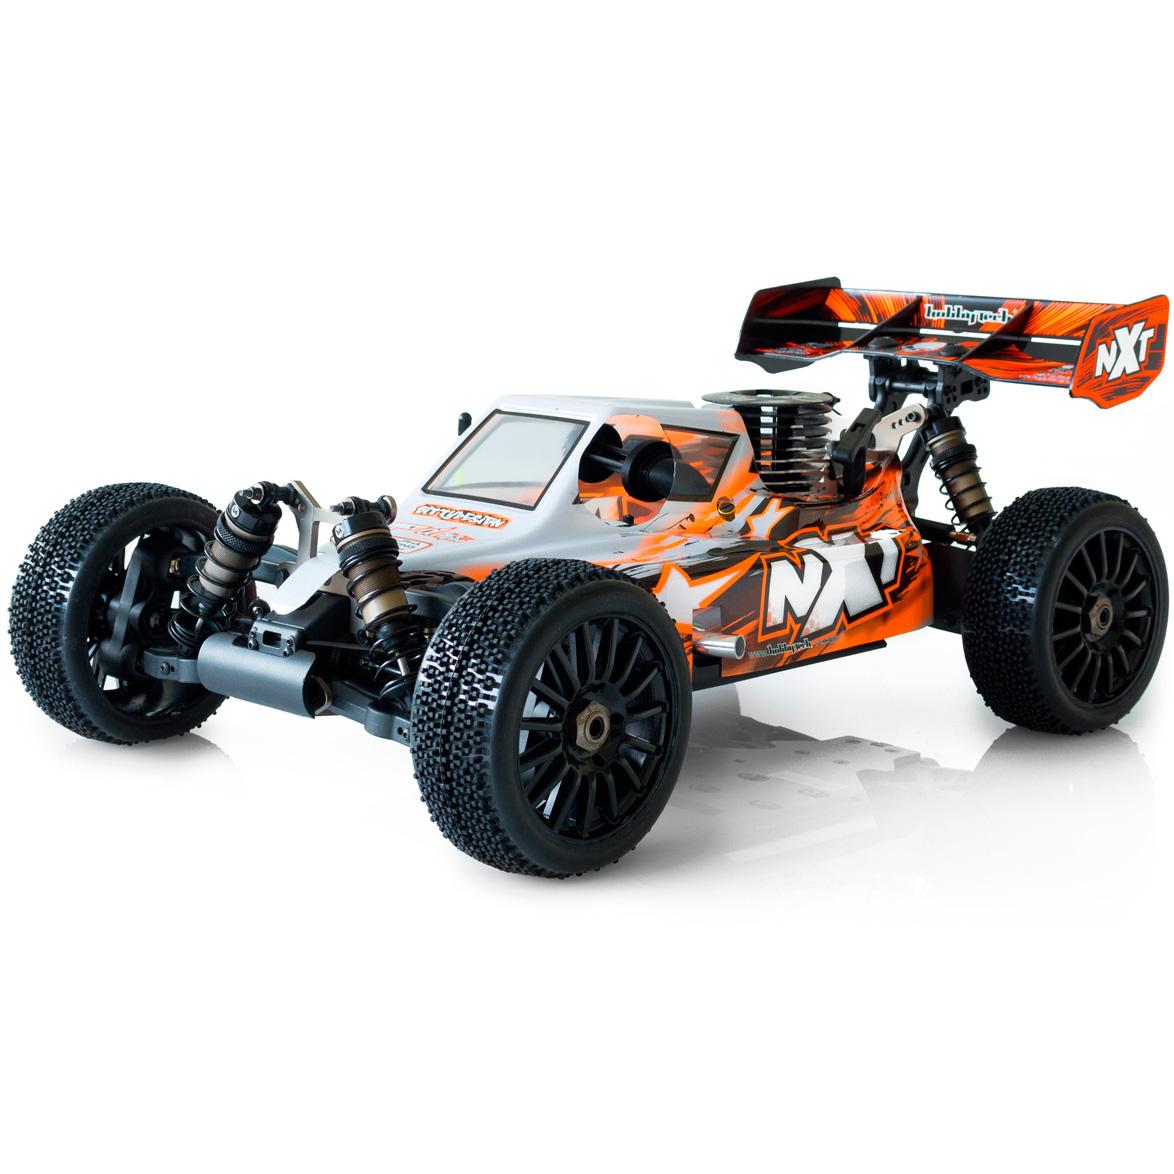 Hobbytech Spirit NXT GP 1/8 RTR